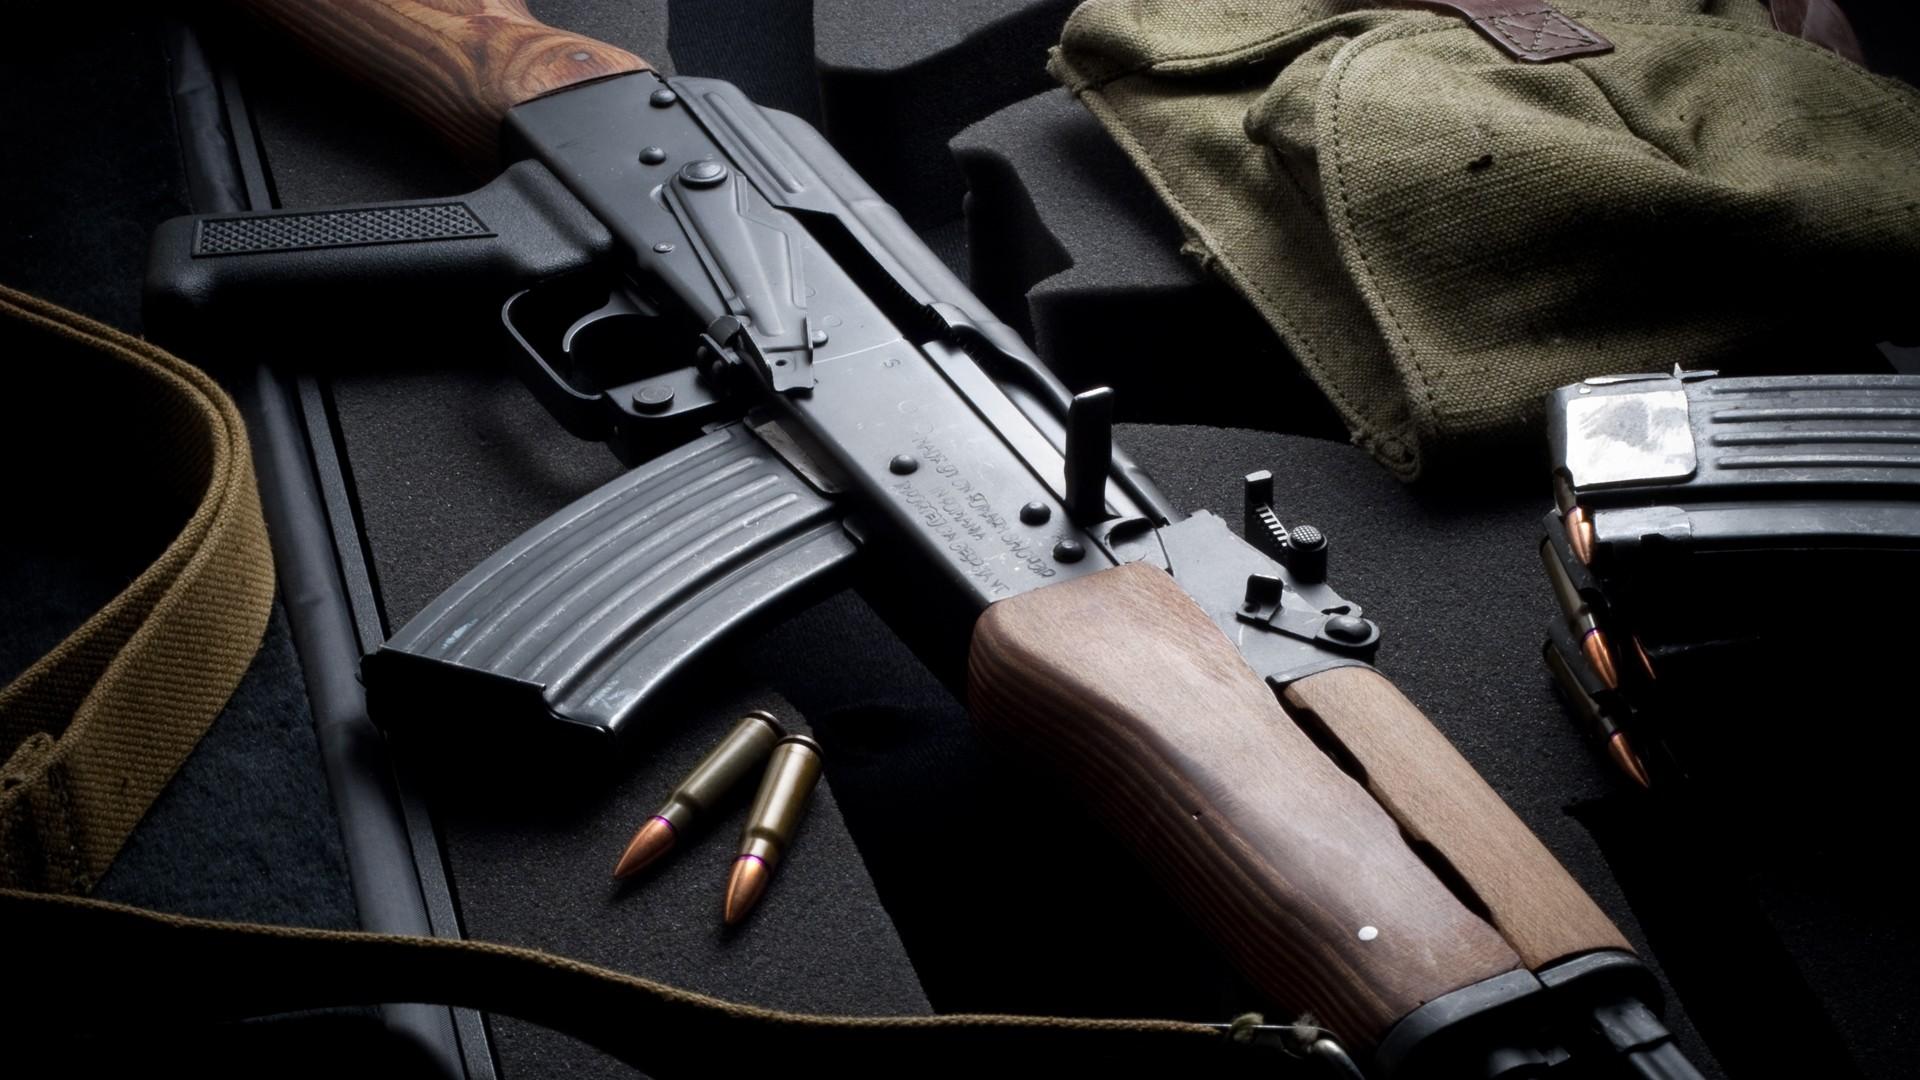 Gun Weapon Military Rifles Handgun Type 56 Kalashnikov Firearm Accessory